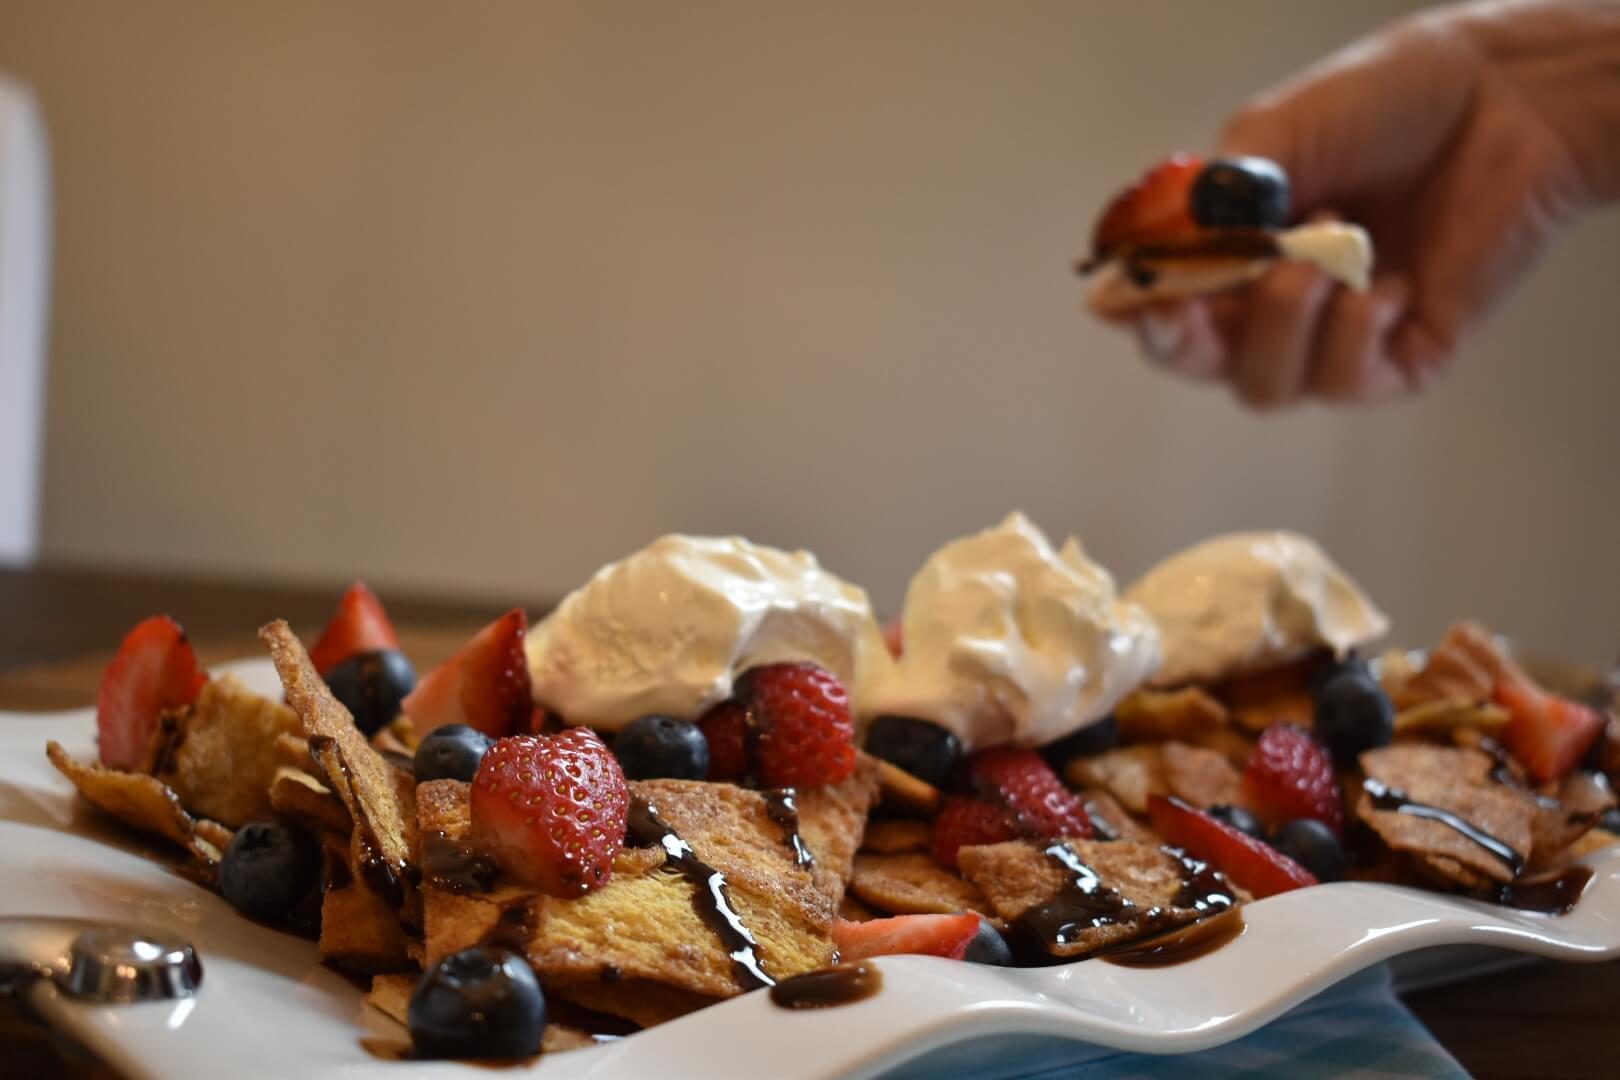 Gameday Dessert Nachos Recipes from Wish Farms Florida & California Berry Grower